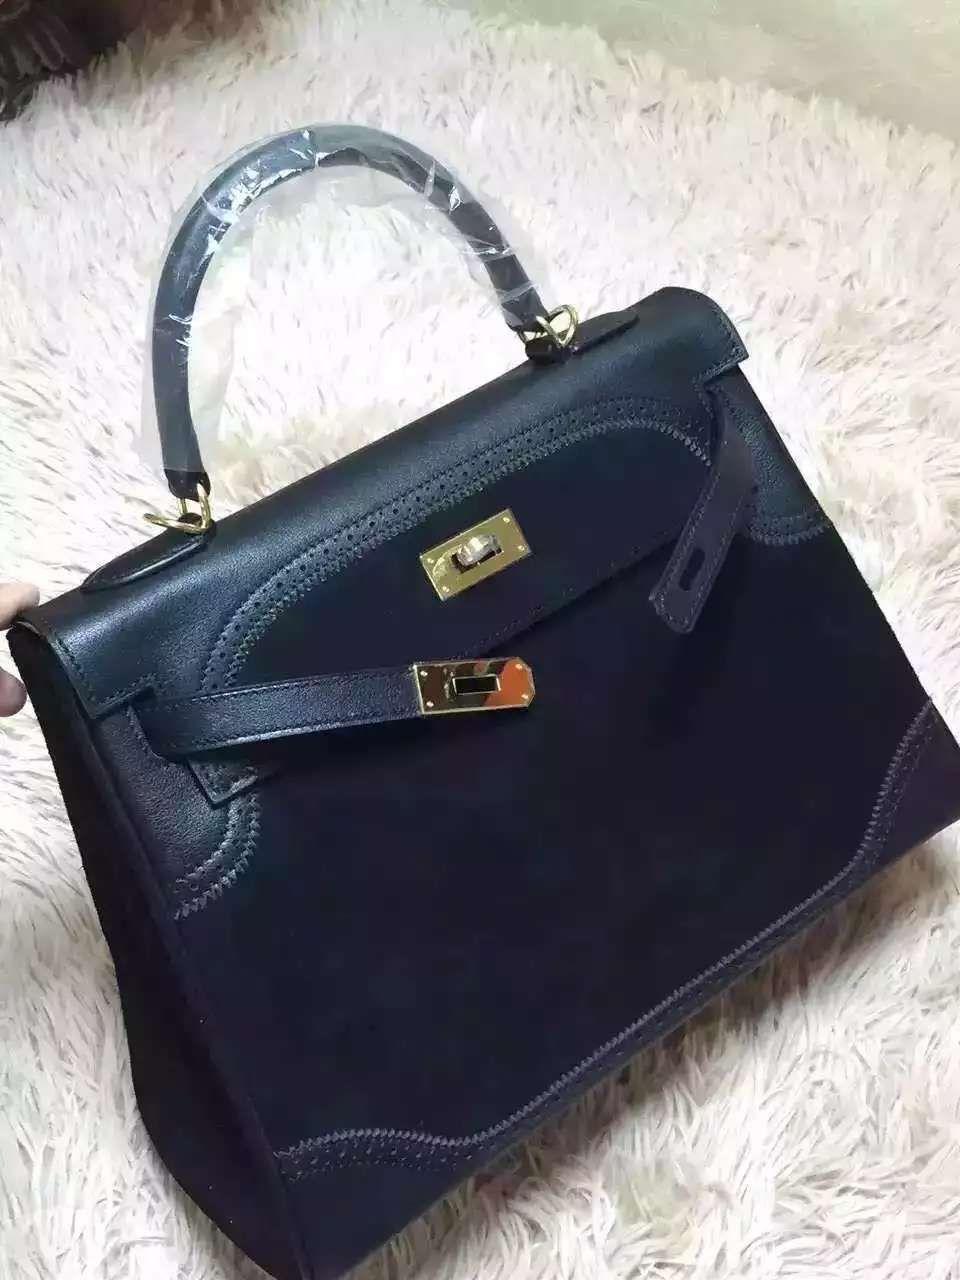 hermès Bag, ID : 37045(FORSALE:a@yybags.com), hermes best handbags, hermes best backpacks, soldes chez hermes, hermes kids backpacks, hermes black leather backpack, hermes designer briefcases, sac hermes, hermes france online store, hermes jansport backpack, hermes leather bags for women, hermes taschen kaufen, hermes ladies handbags brands #hermèsBag #hermès #herm猫s #soldes